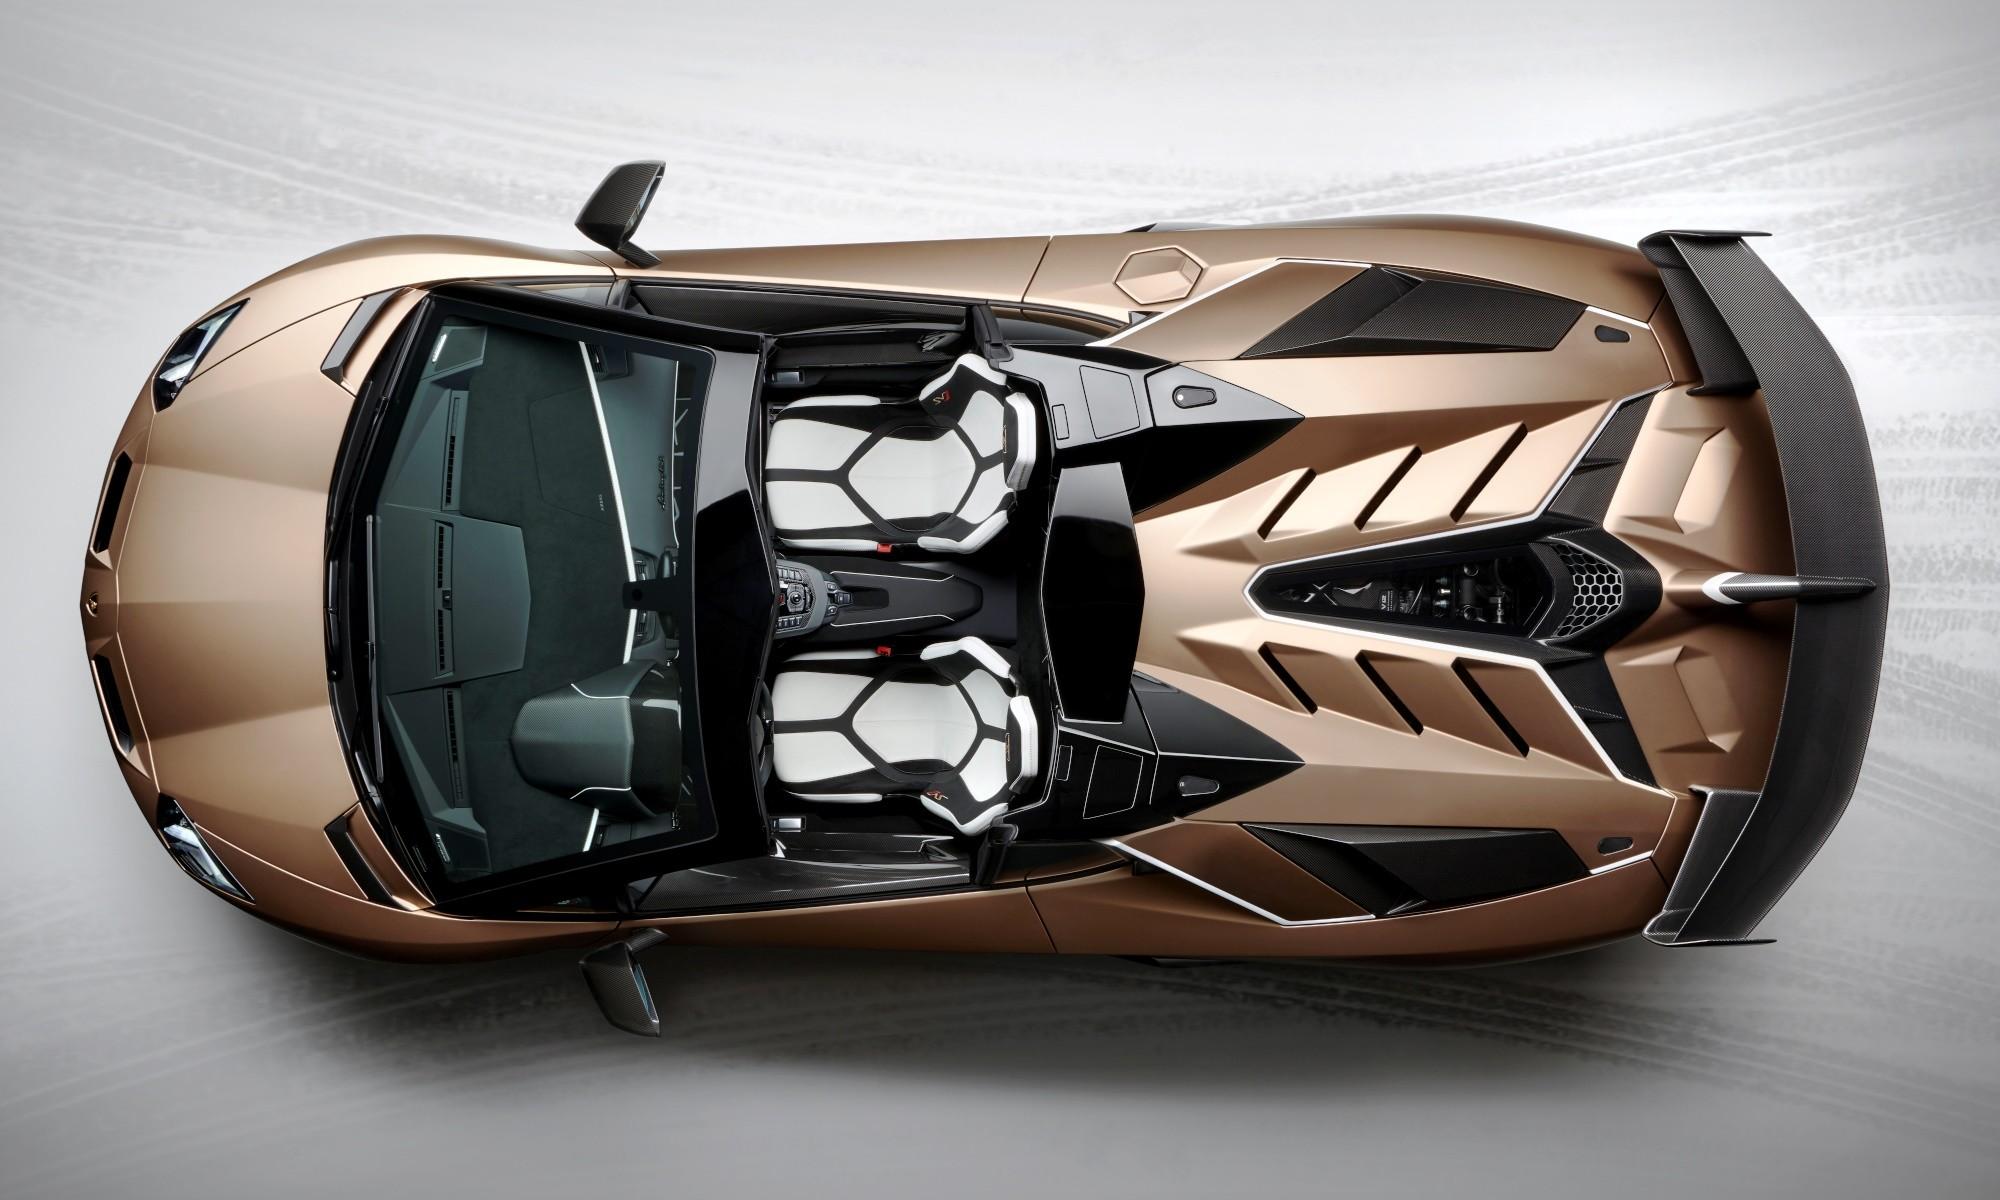 Lamborghini Aventador SVJ Roadster overhead